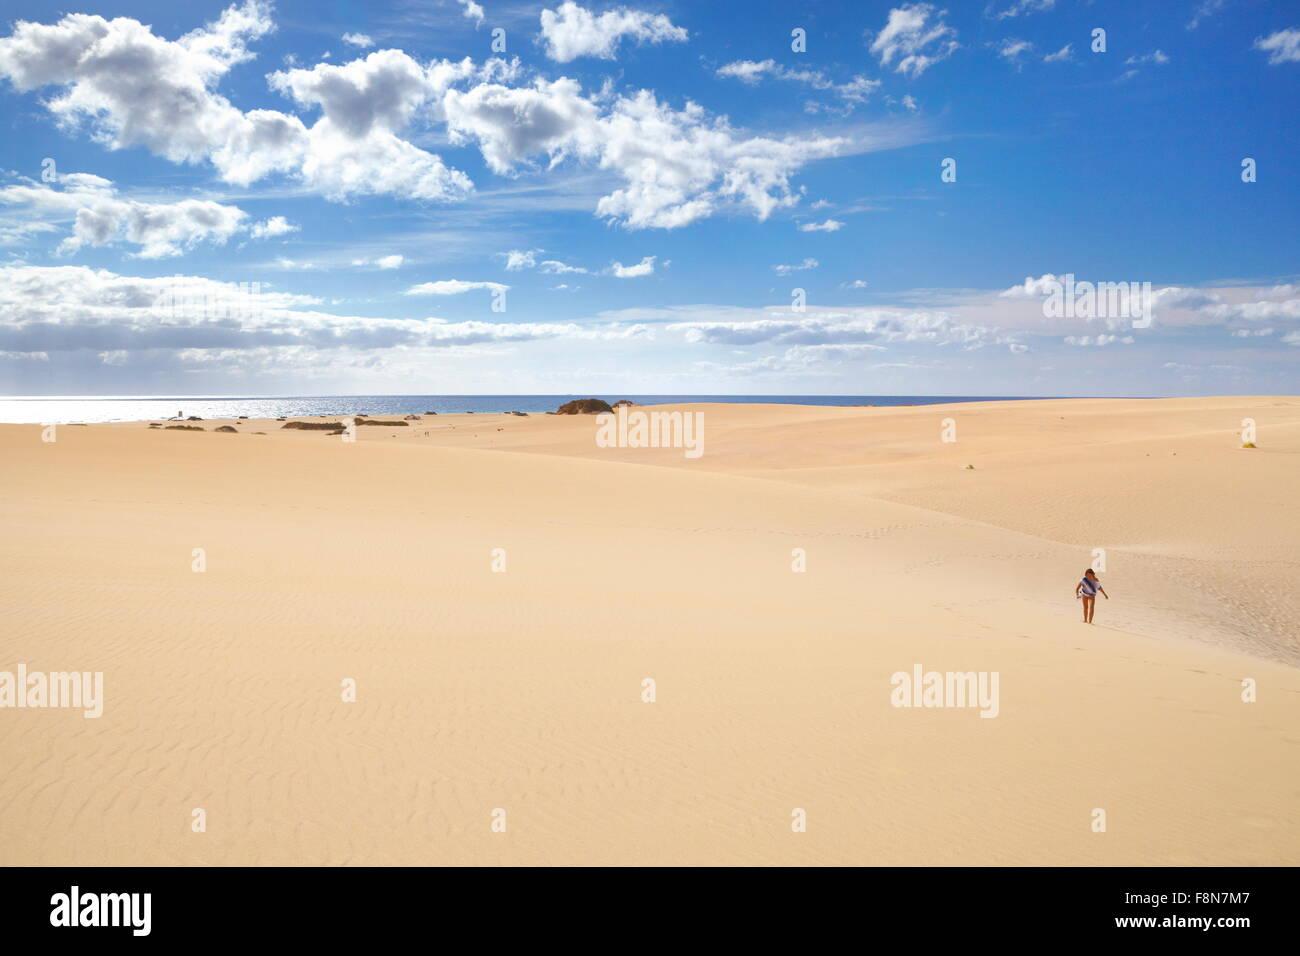 Landschaft aus Sanddünen im Parque Natural de Corralejo, Kanaren Insel Fuerteventura, Spanien Stockbild